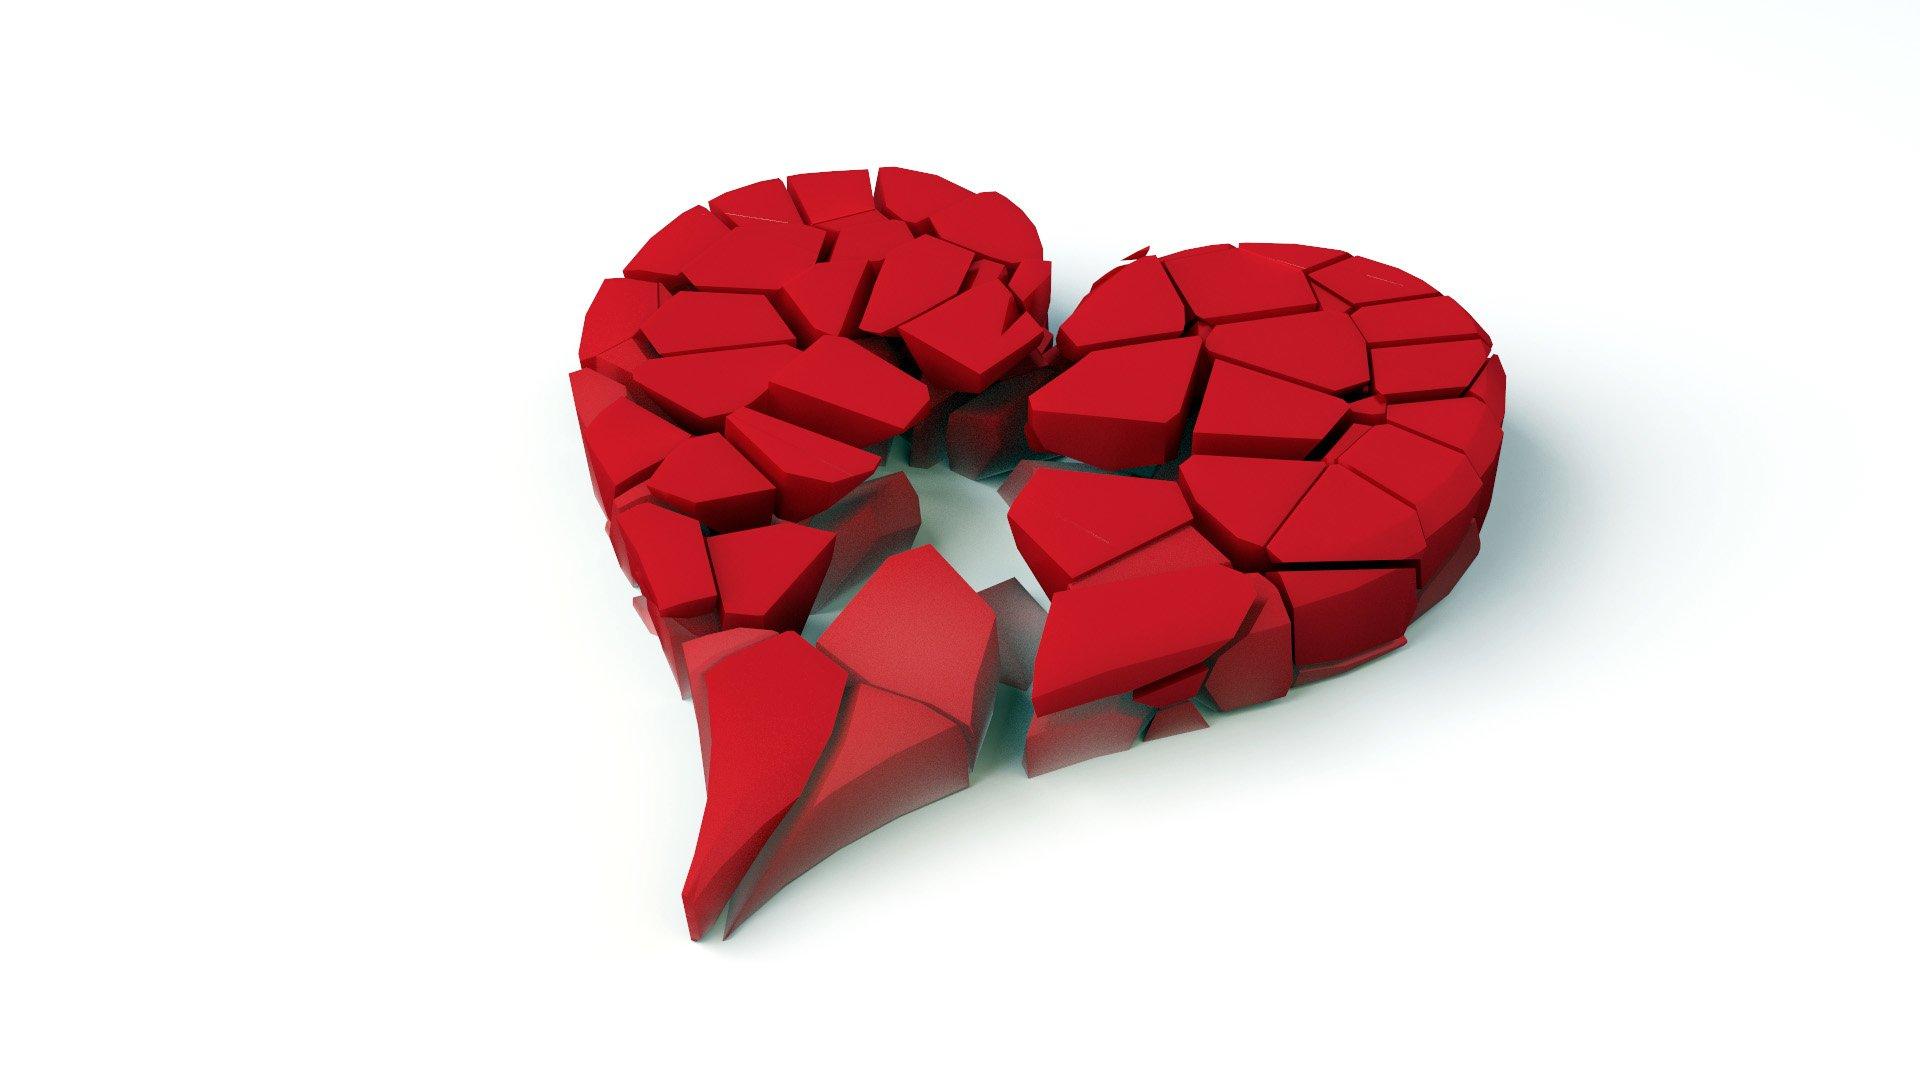 broken heart hd wallpaper background image 1920x1080 id 801182